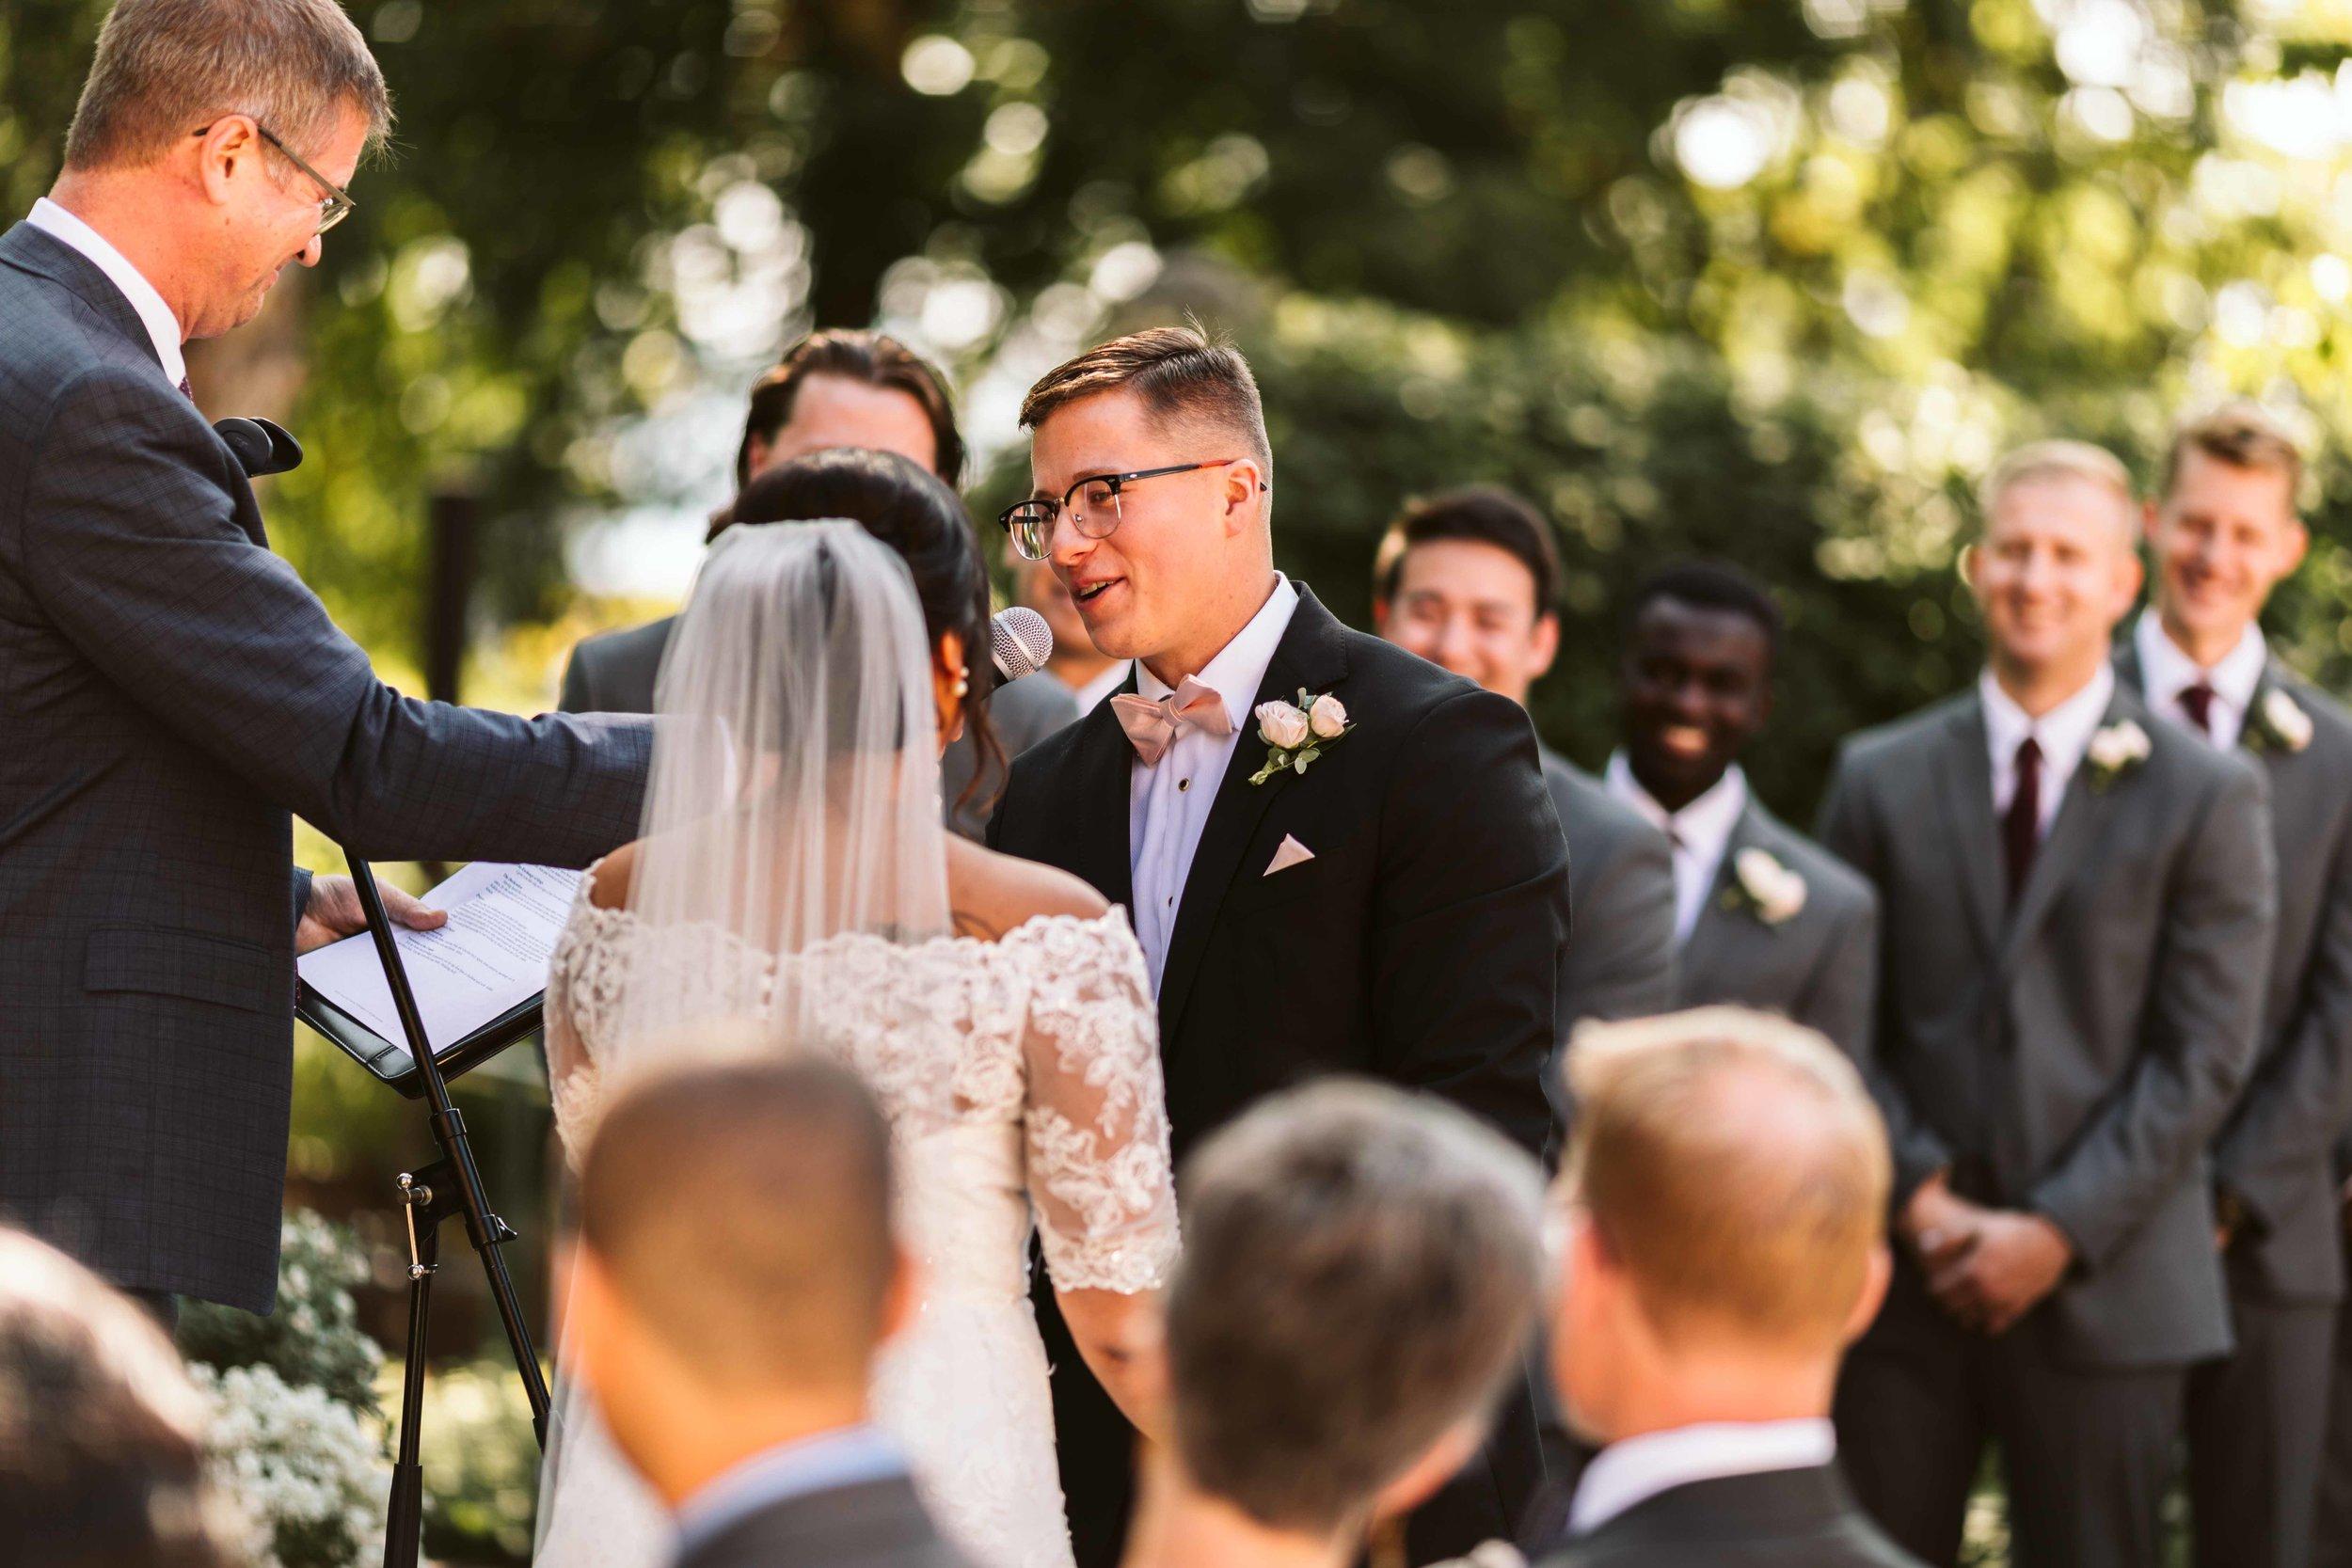 lairmont-manor-wedding-61.jpg